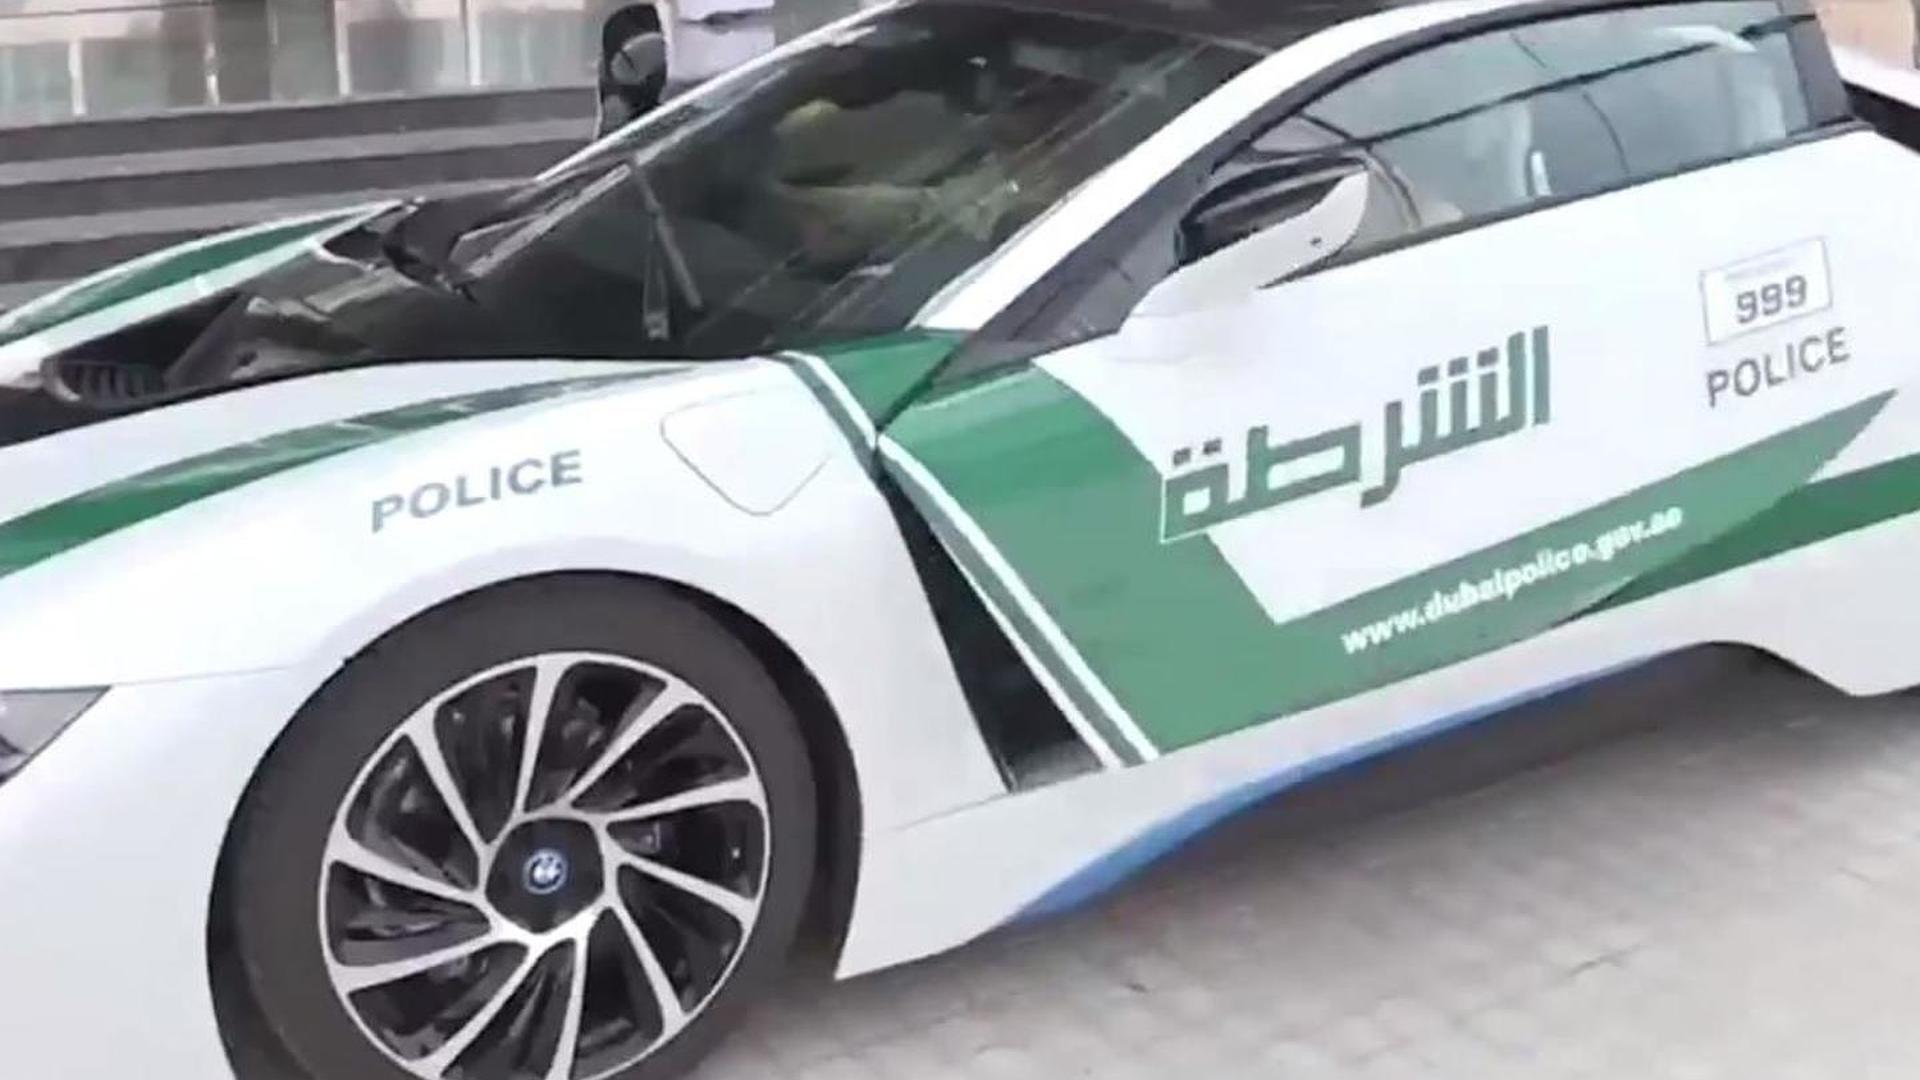 Dubai Police Fleet Expands With Bmw I8 Video